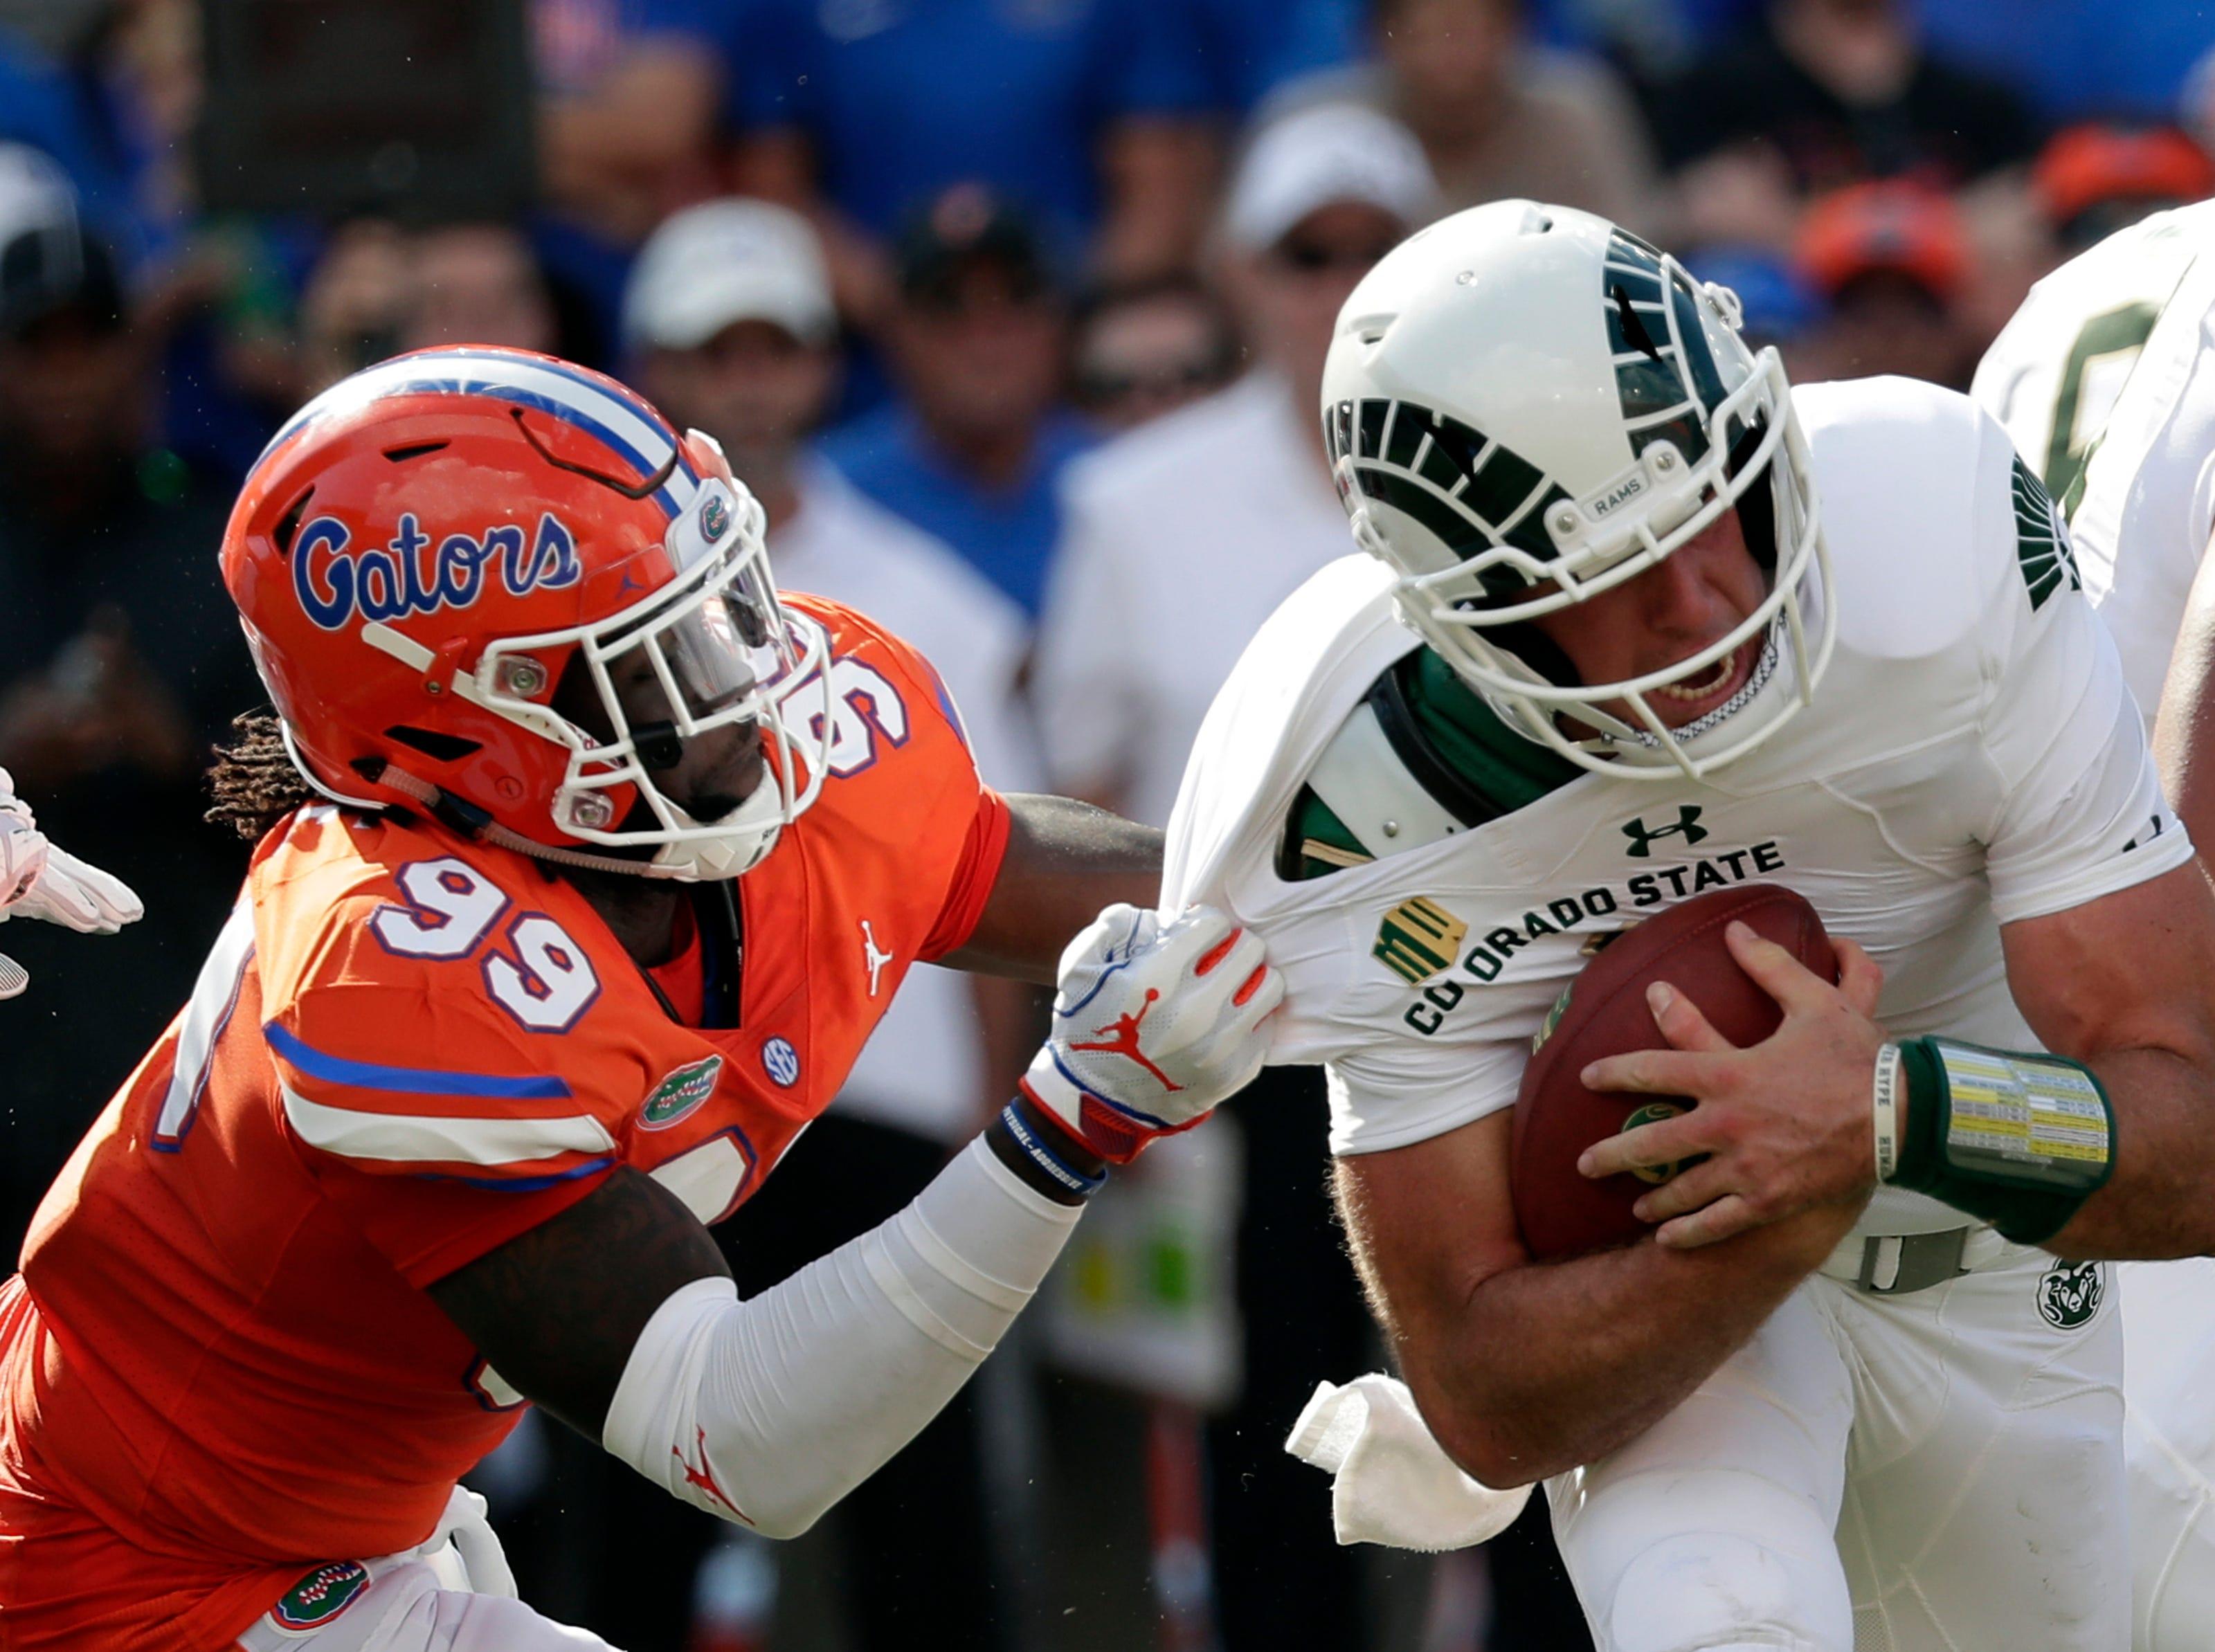 Florida defensive lineman Jachai Polite (99) sacks Colorado State quarterback K.J. Carta-Samuels during the first half of an NCAA college football game, Saturday, Sept. 15, 2018, in Gainesville, Fla. (AP Photo/John Raoux)